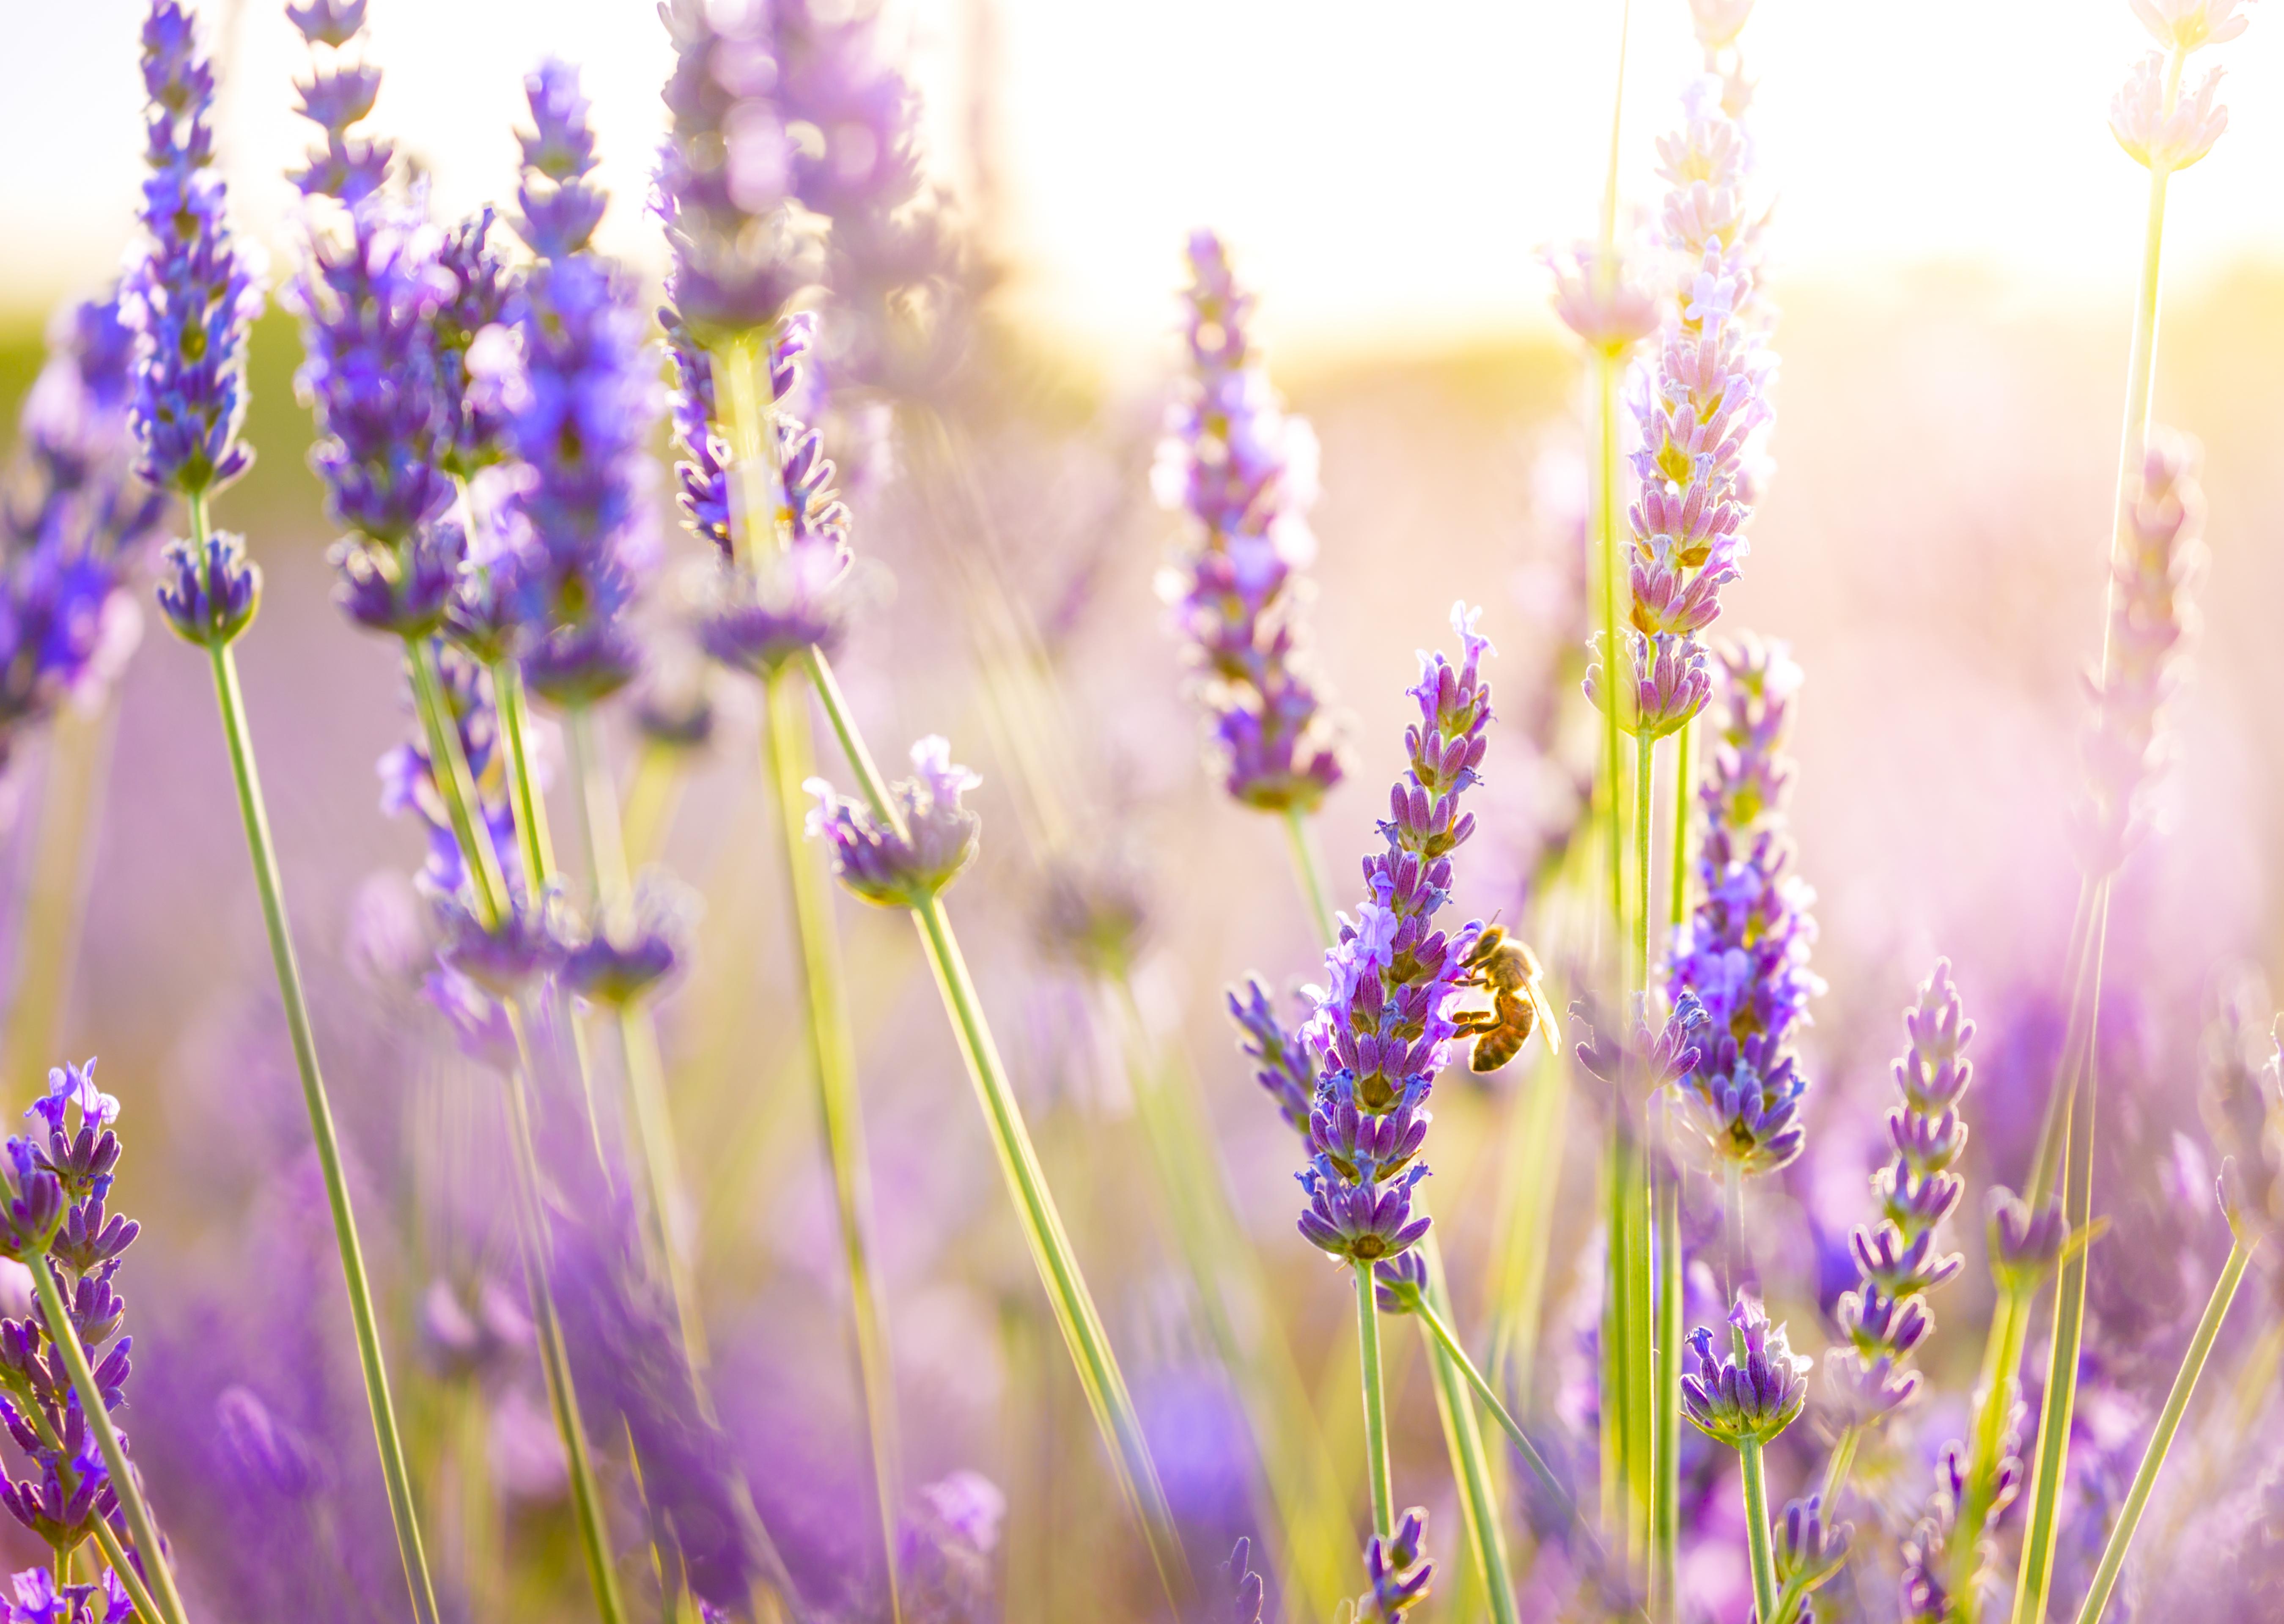 Flor alfazema lavanda